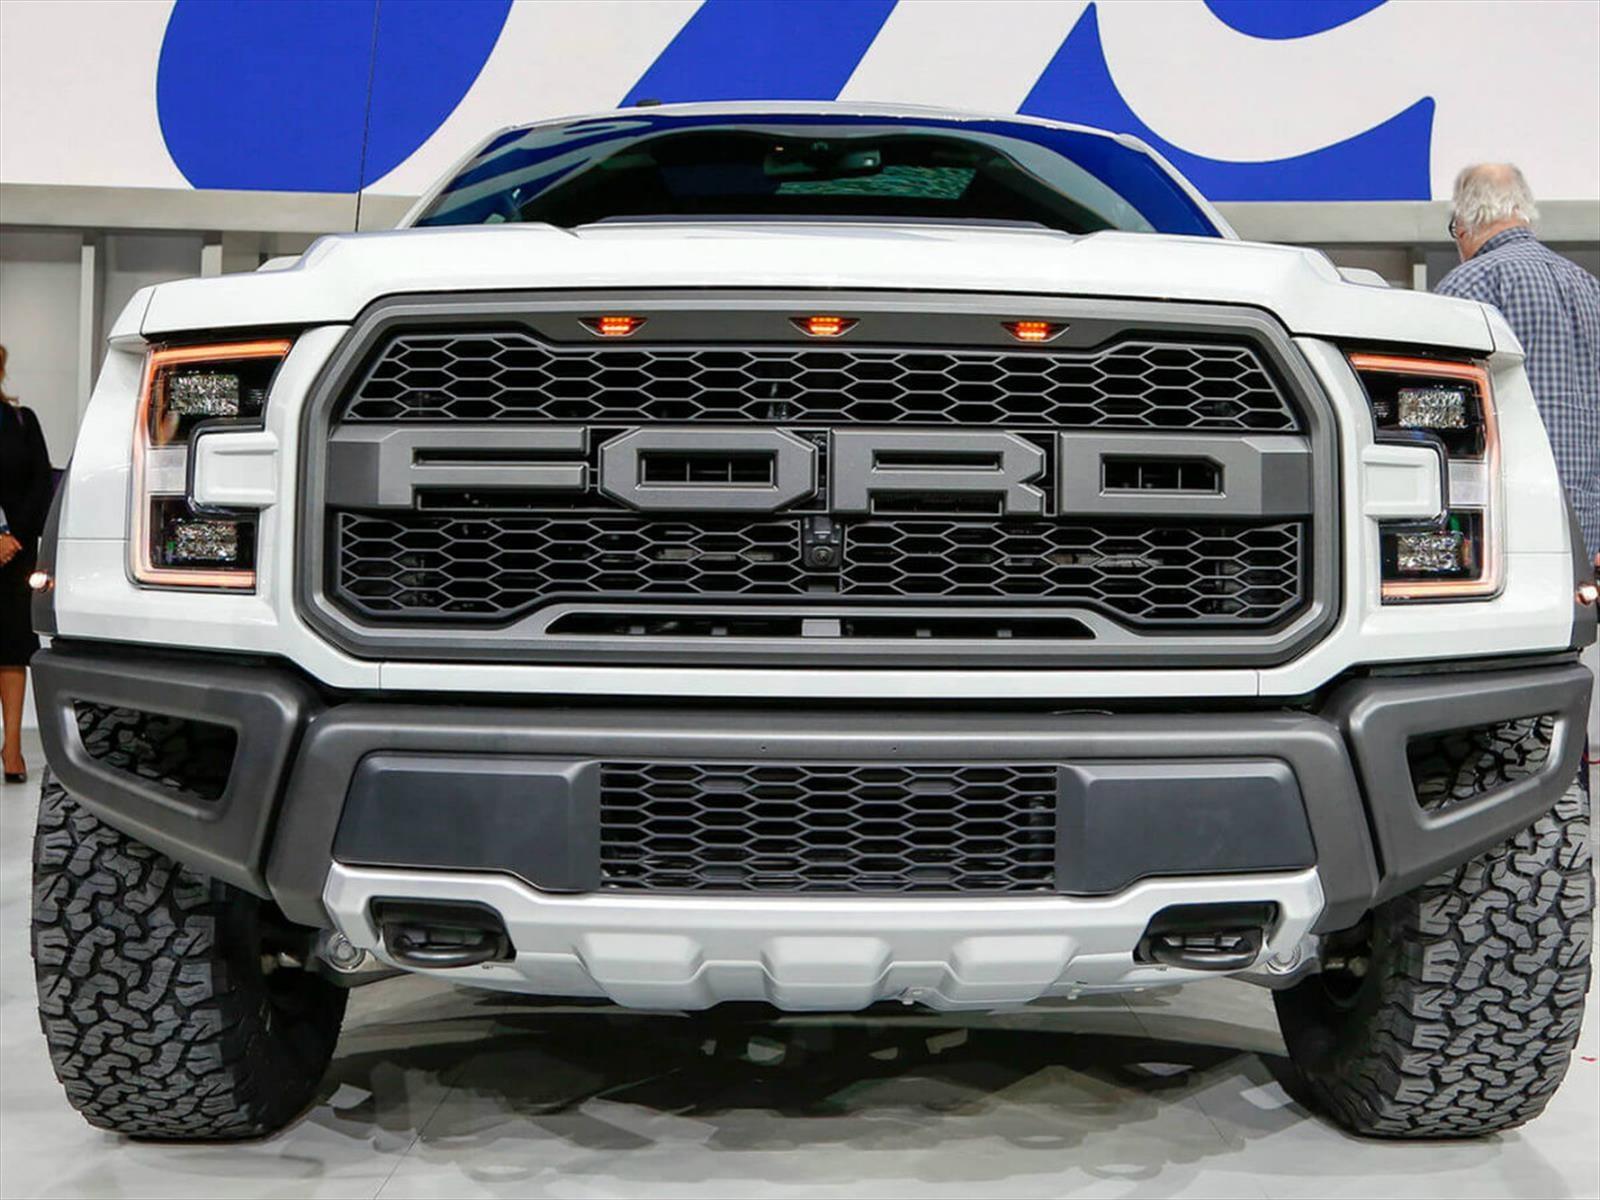 Ford Raptor 2017 subastada por $157,000 dólares